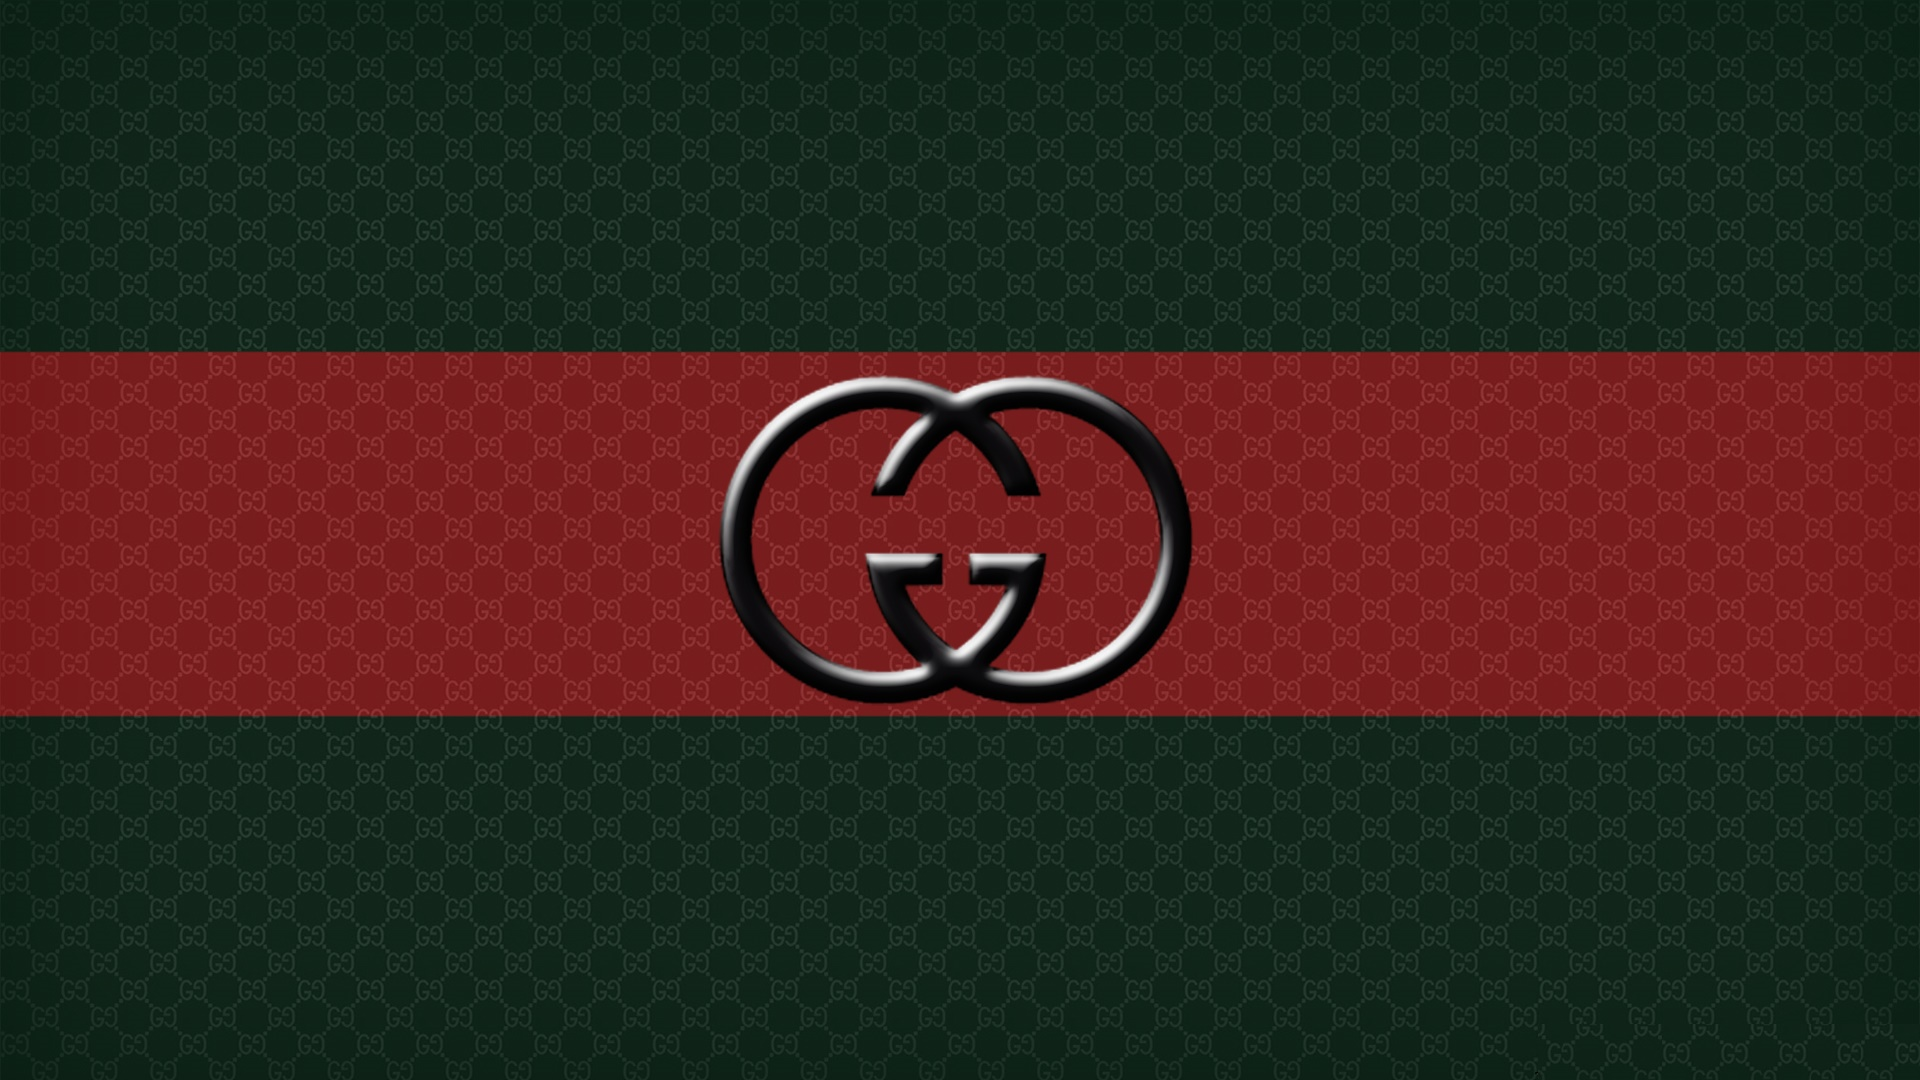 Gold 3d Hd Wallpapers Gucci Logo Wallpapers Hd Pixelstalk Net